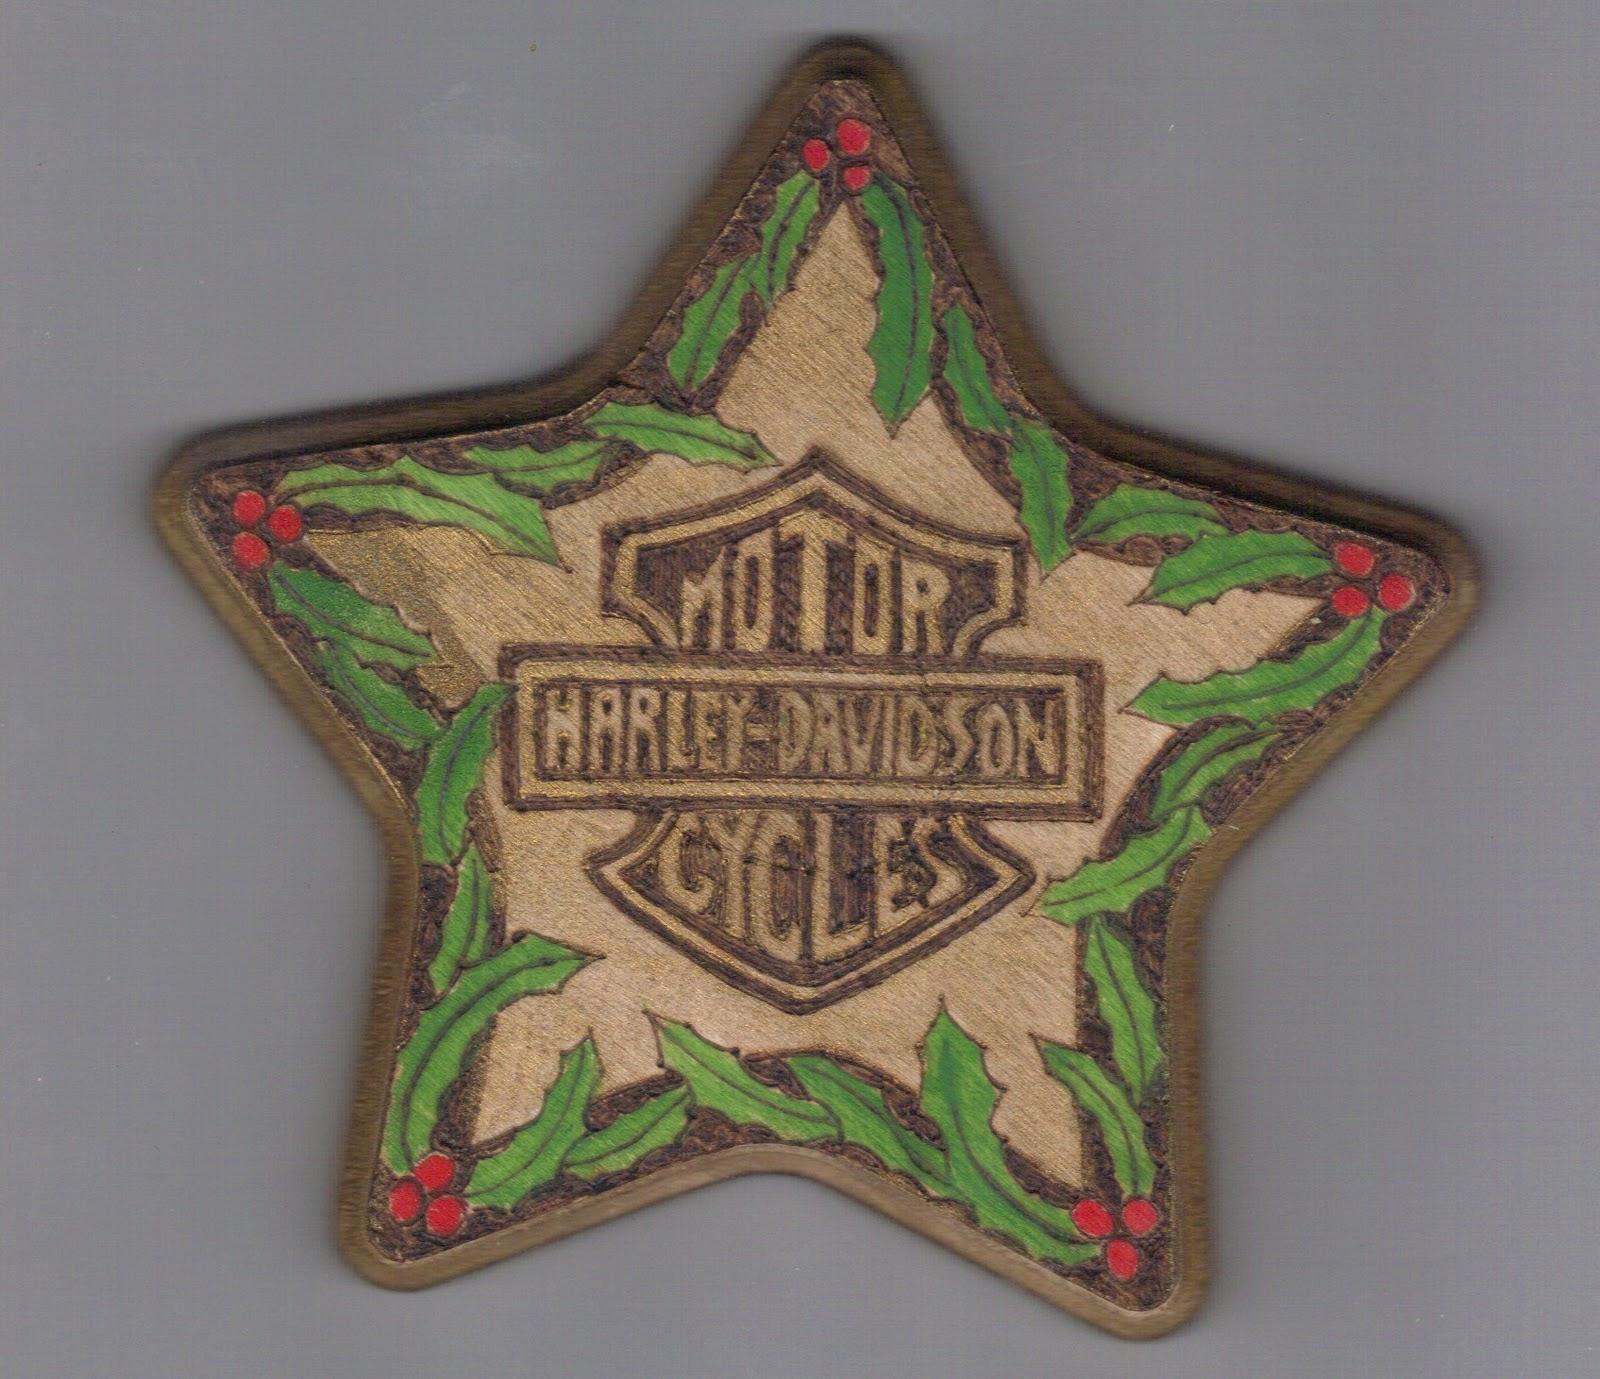 The Knothole News: Harley Davidson Christmas Ornaments on Wood